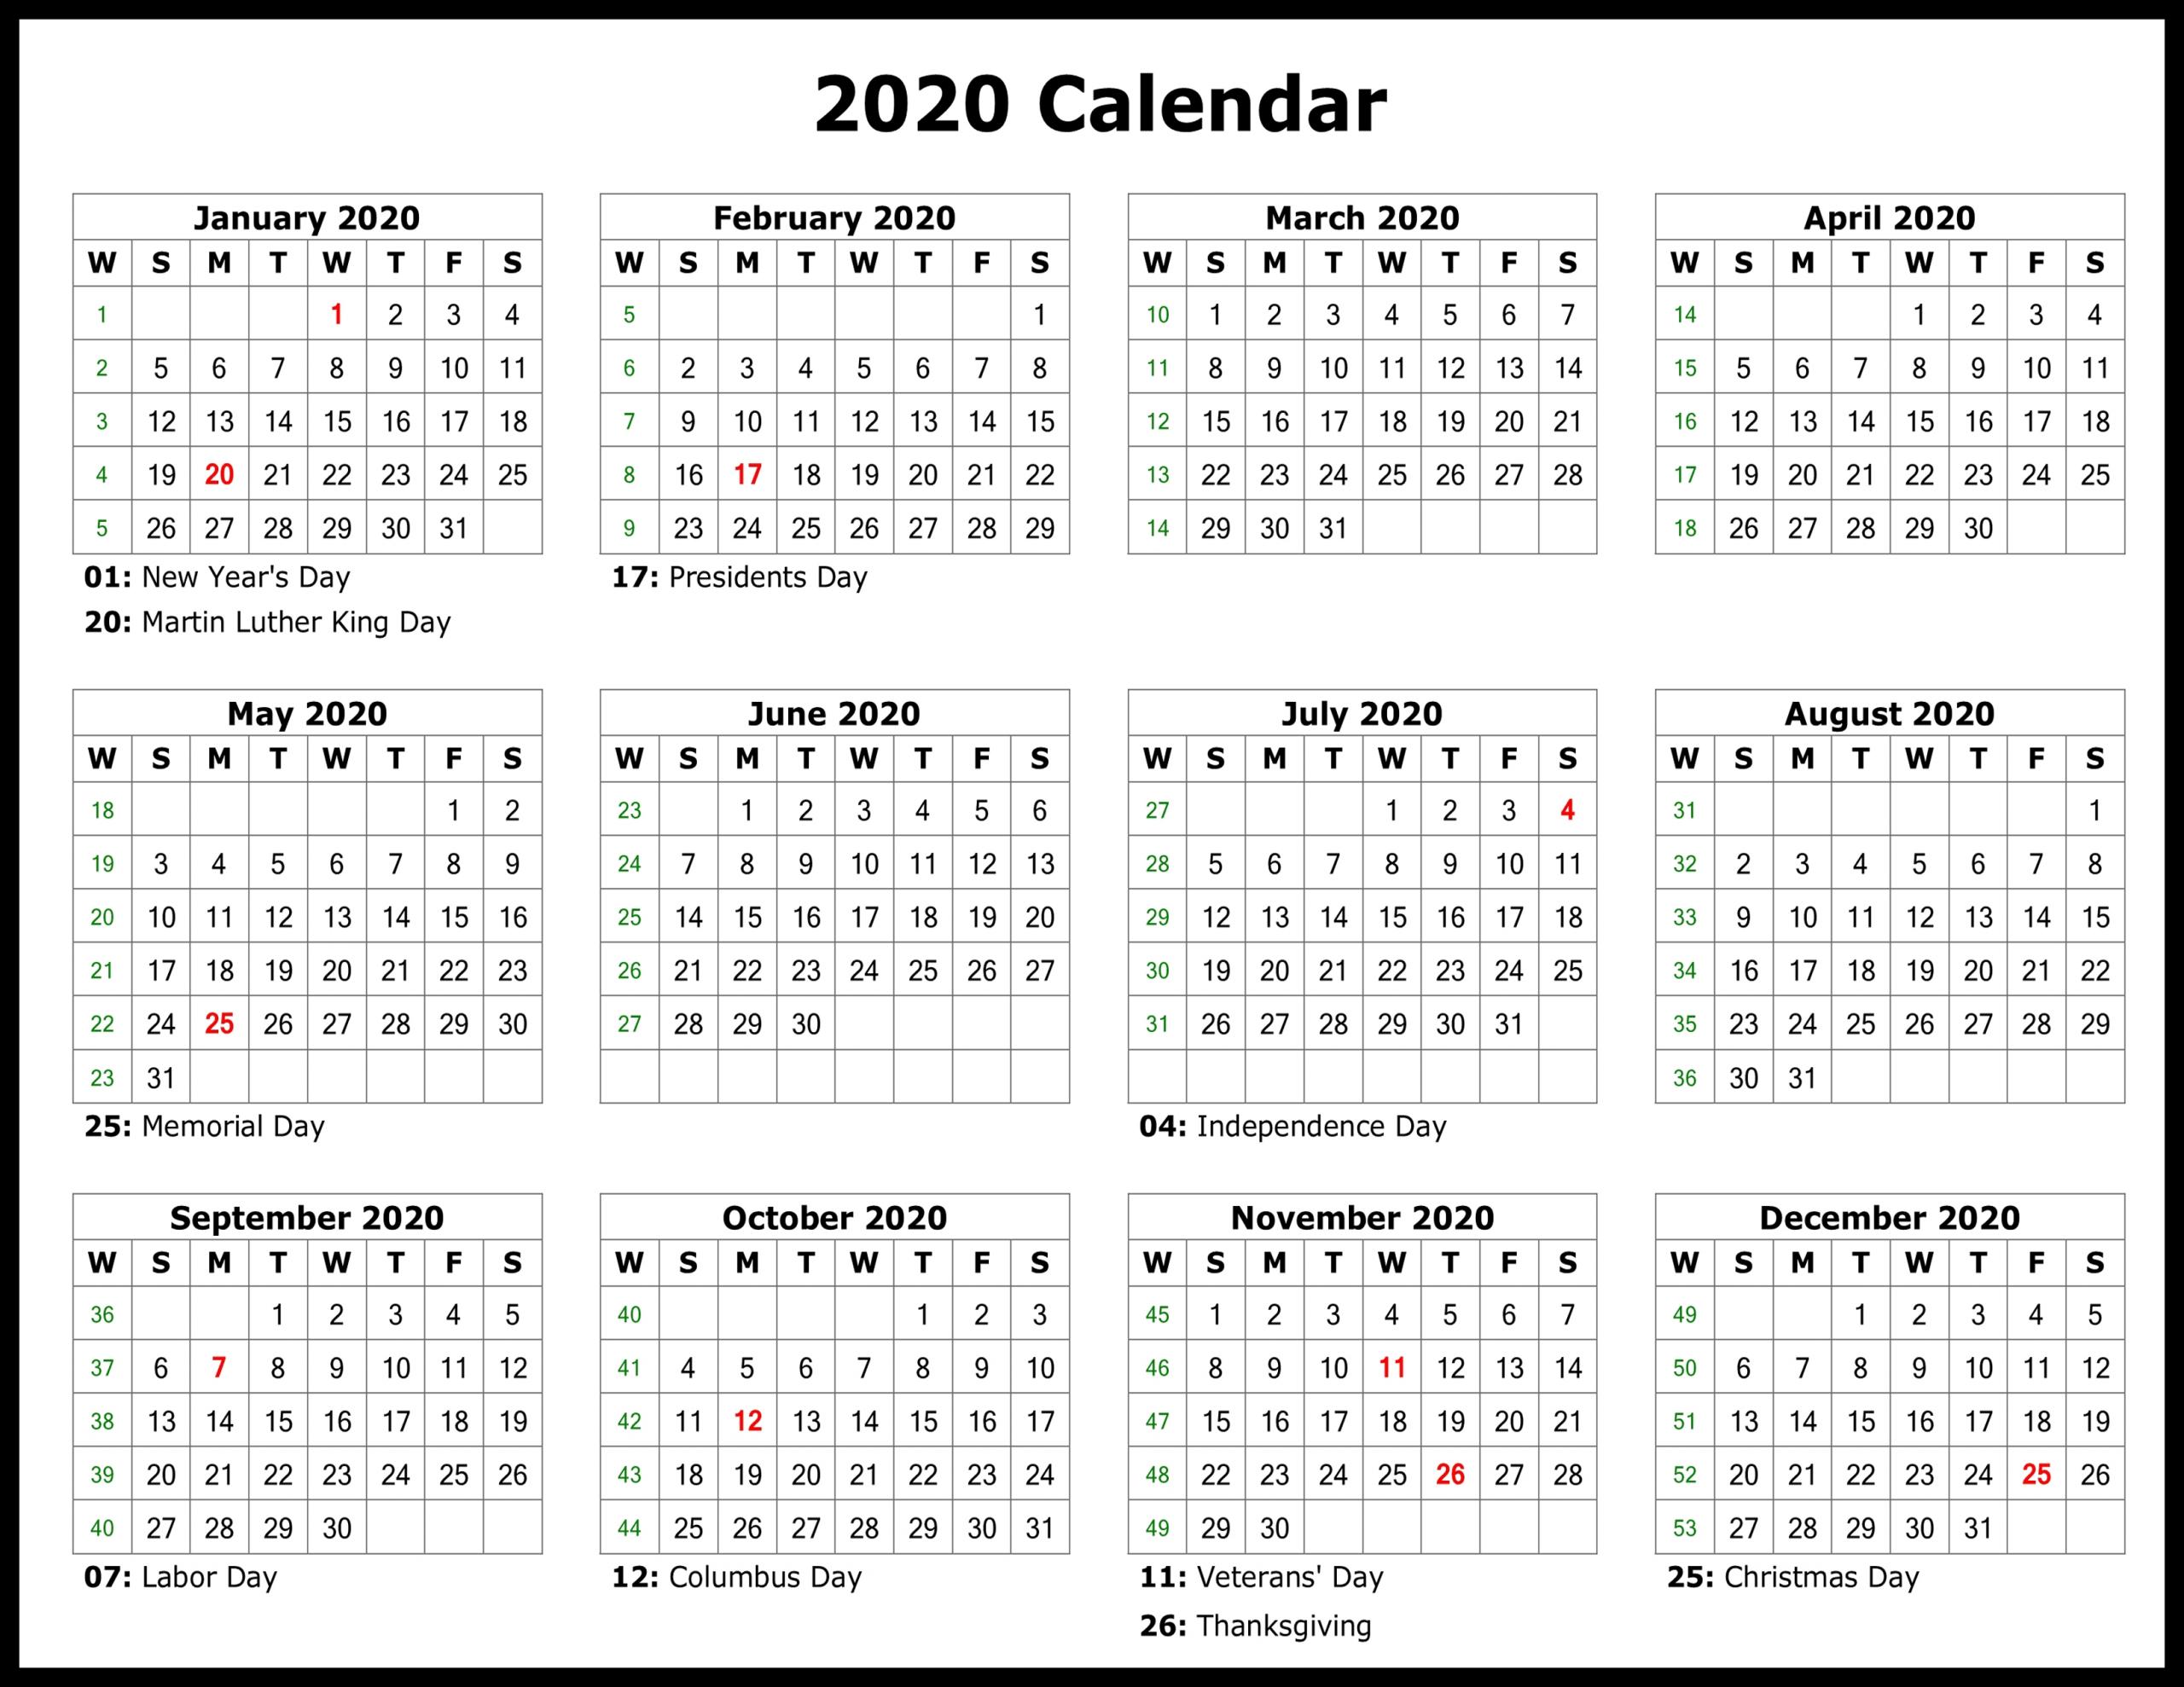 2020 Calendar You Can Edit | Month Calendar Printable Free Printable Calendar That I Can Edit